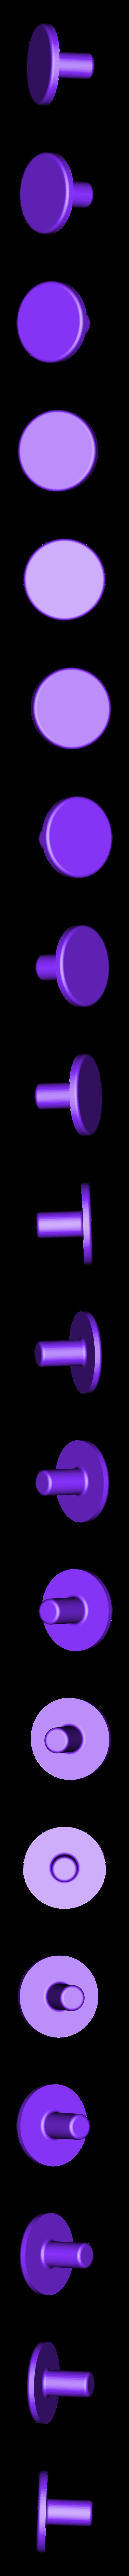 eolienne_2_bout_cone.STL Download free STL file Eolienne Wind turbine • 3D printing model, lulu3Dbuilder